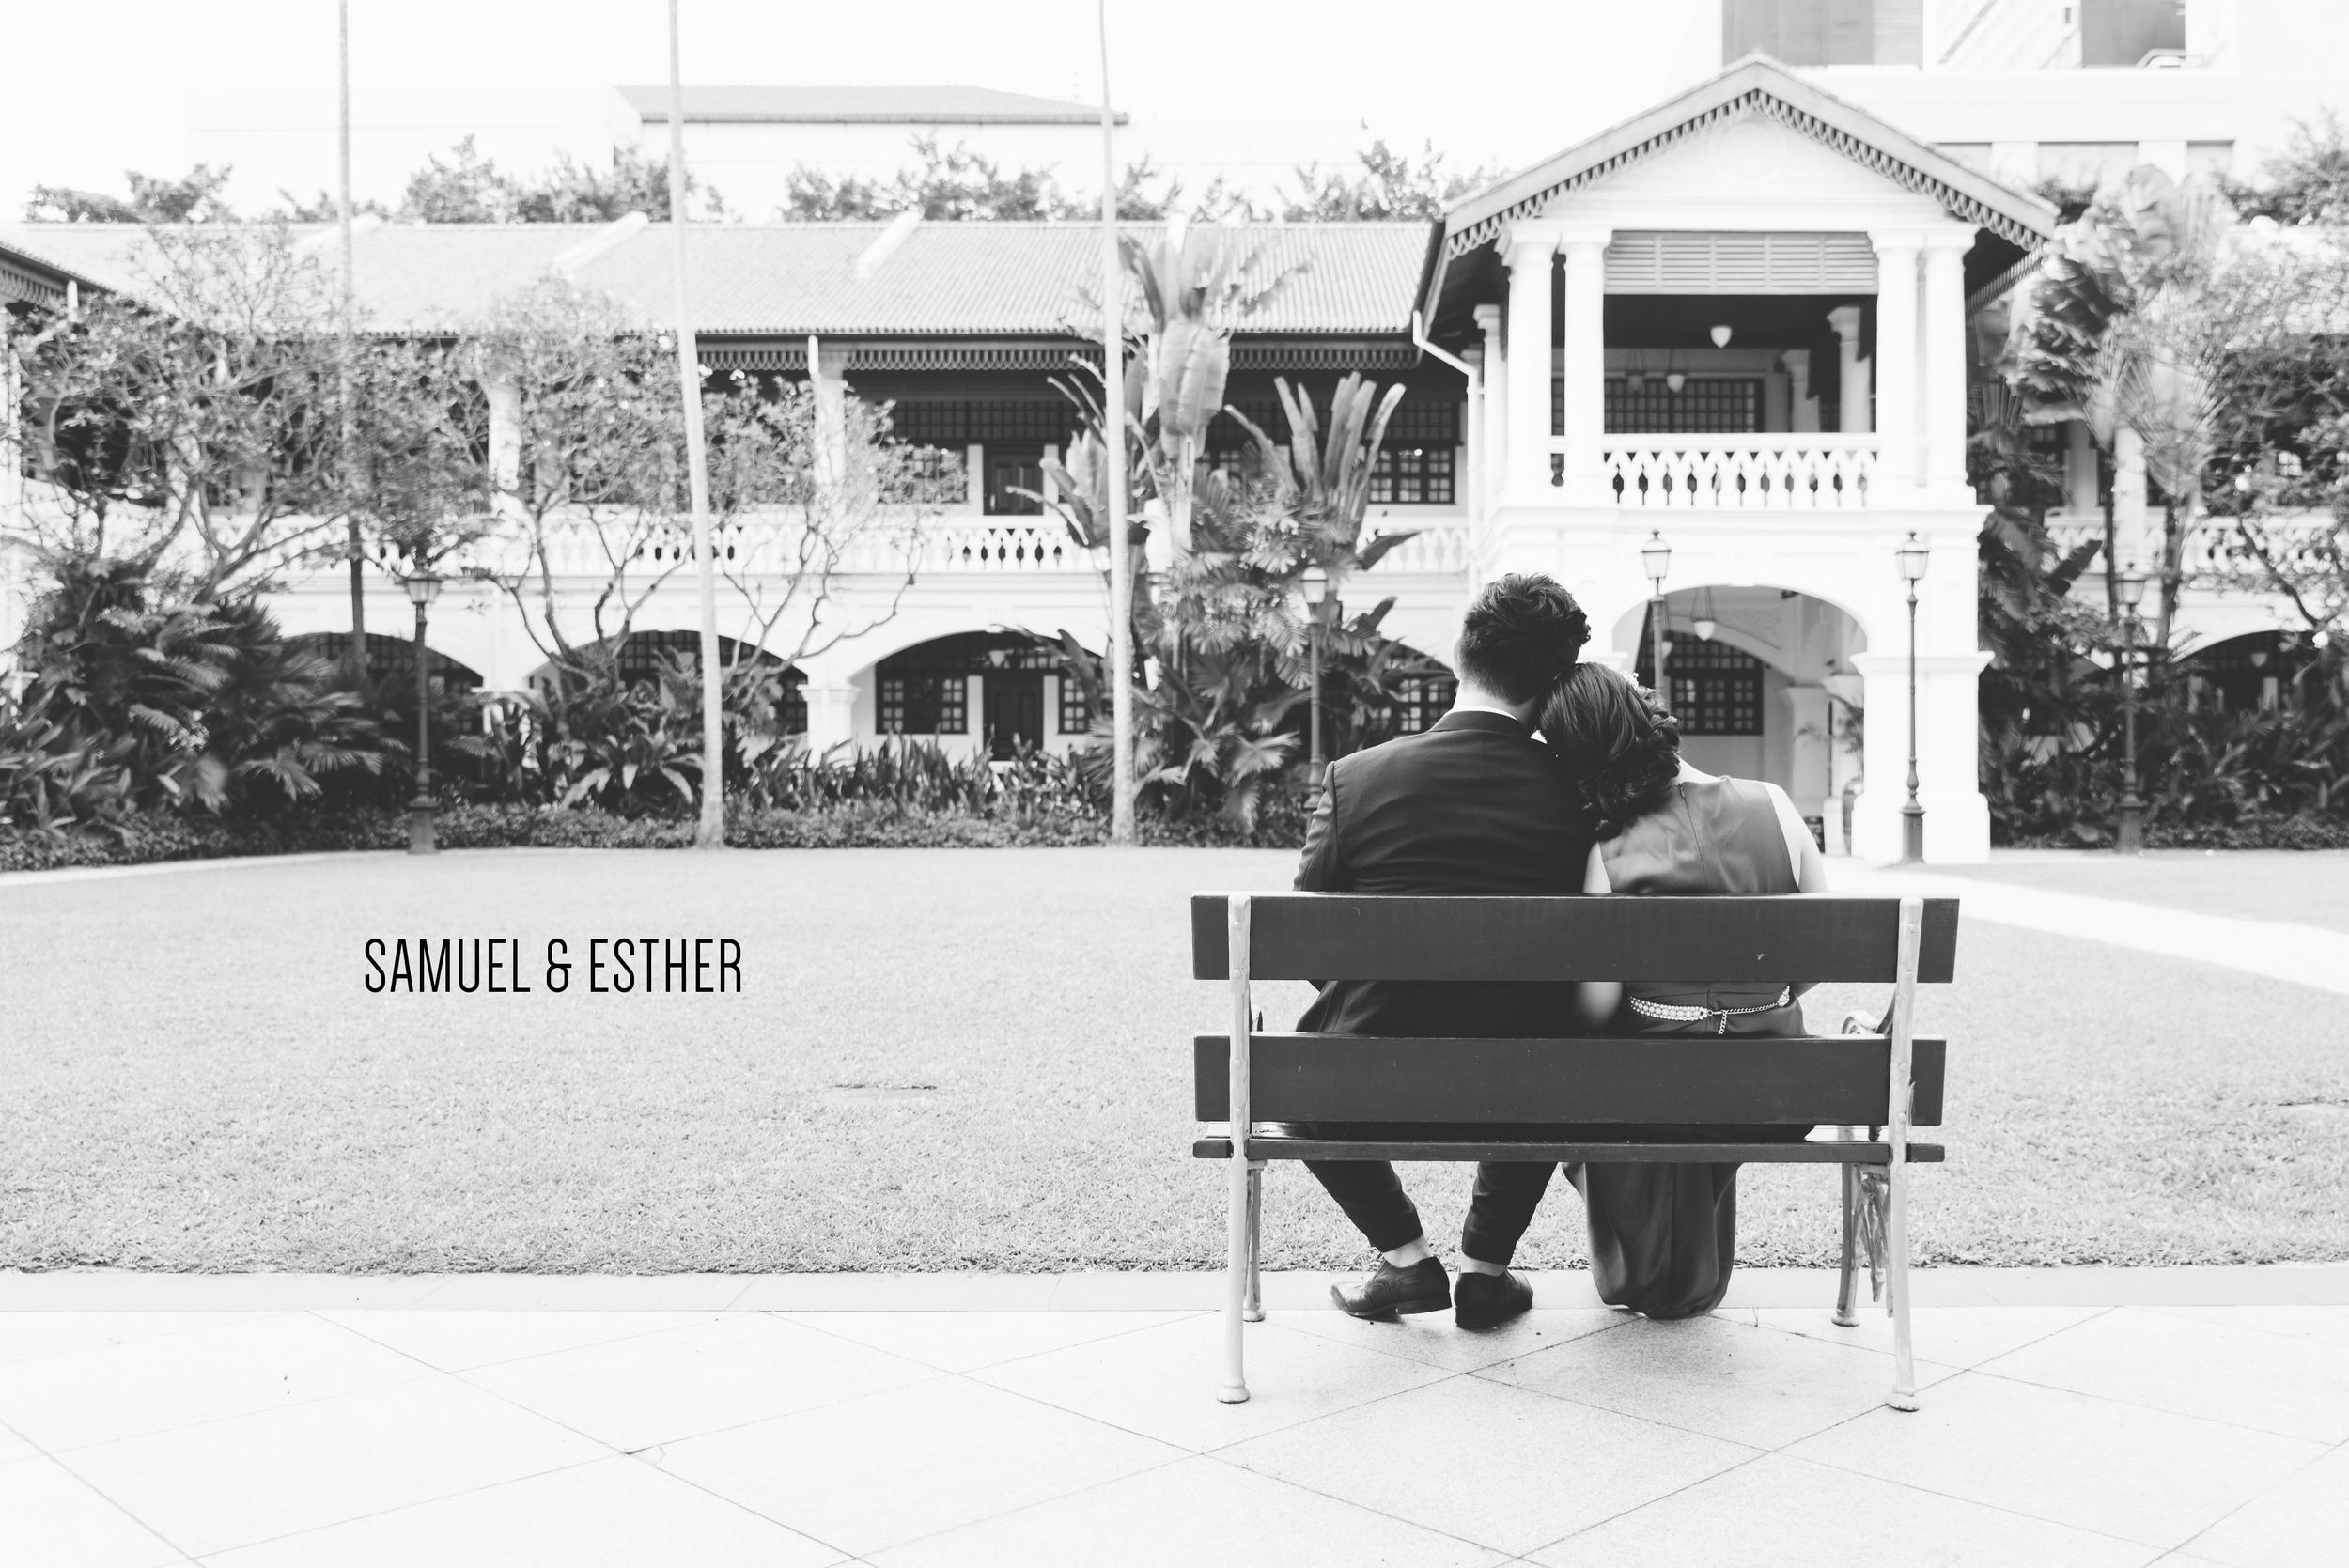 Samuel n Esther